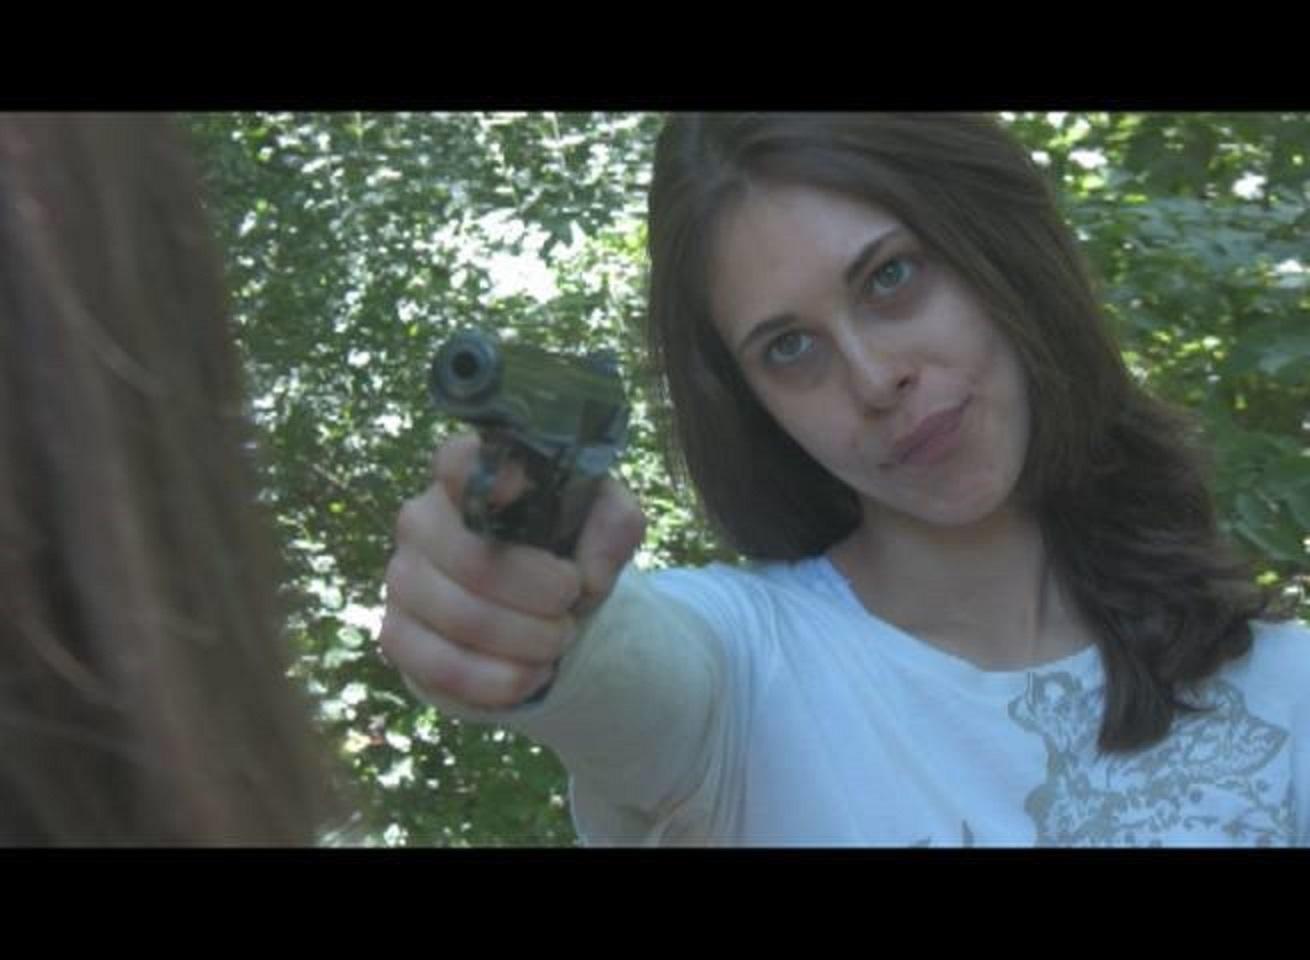 Daisy Derkins vs. The Bloodthirsty Beast of Barren Pines!